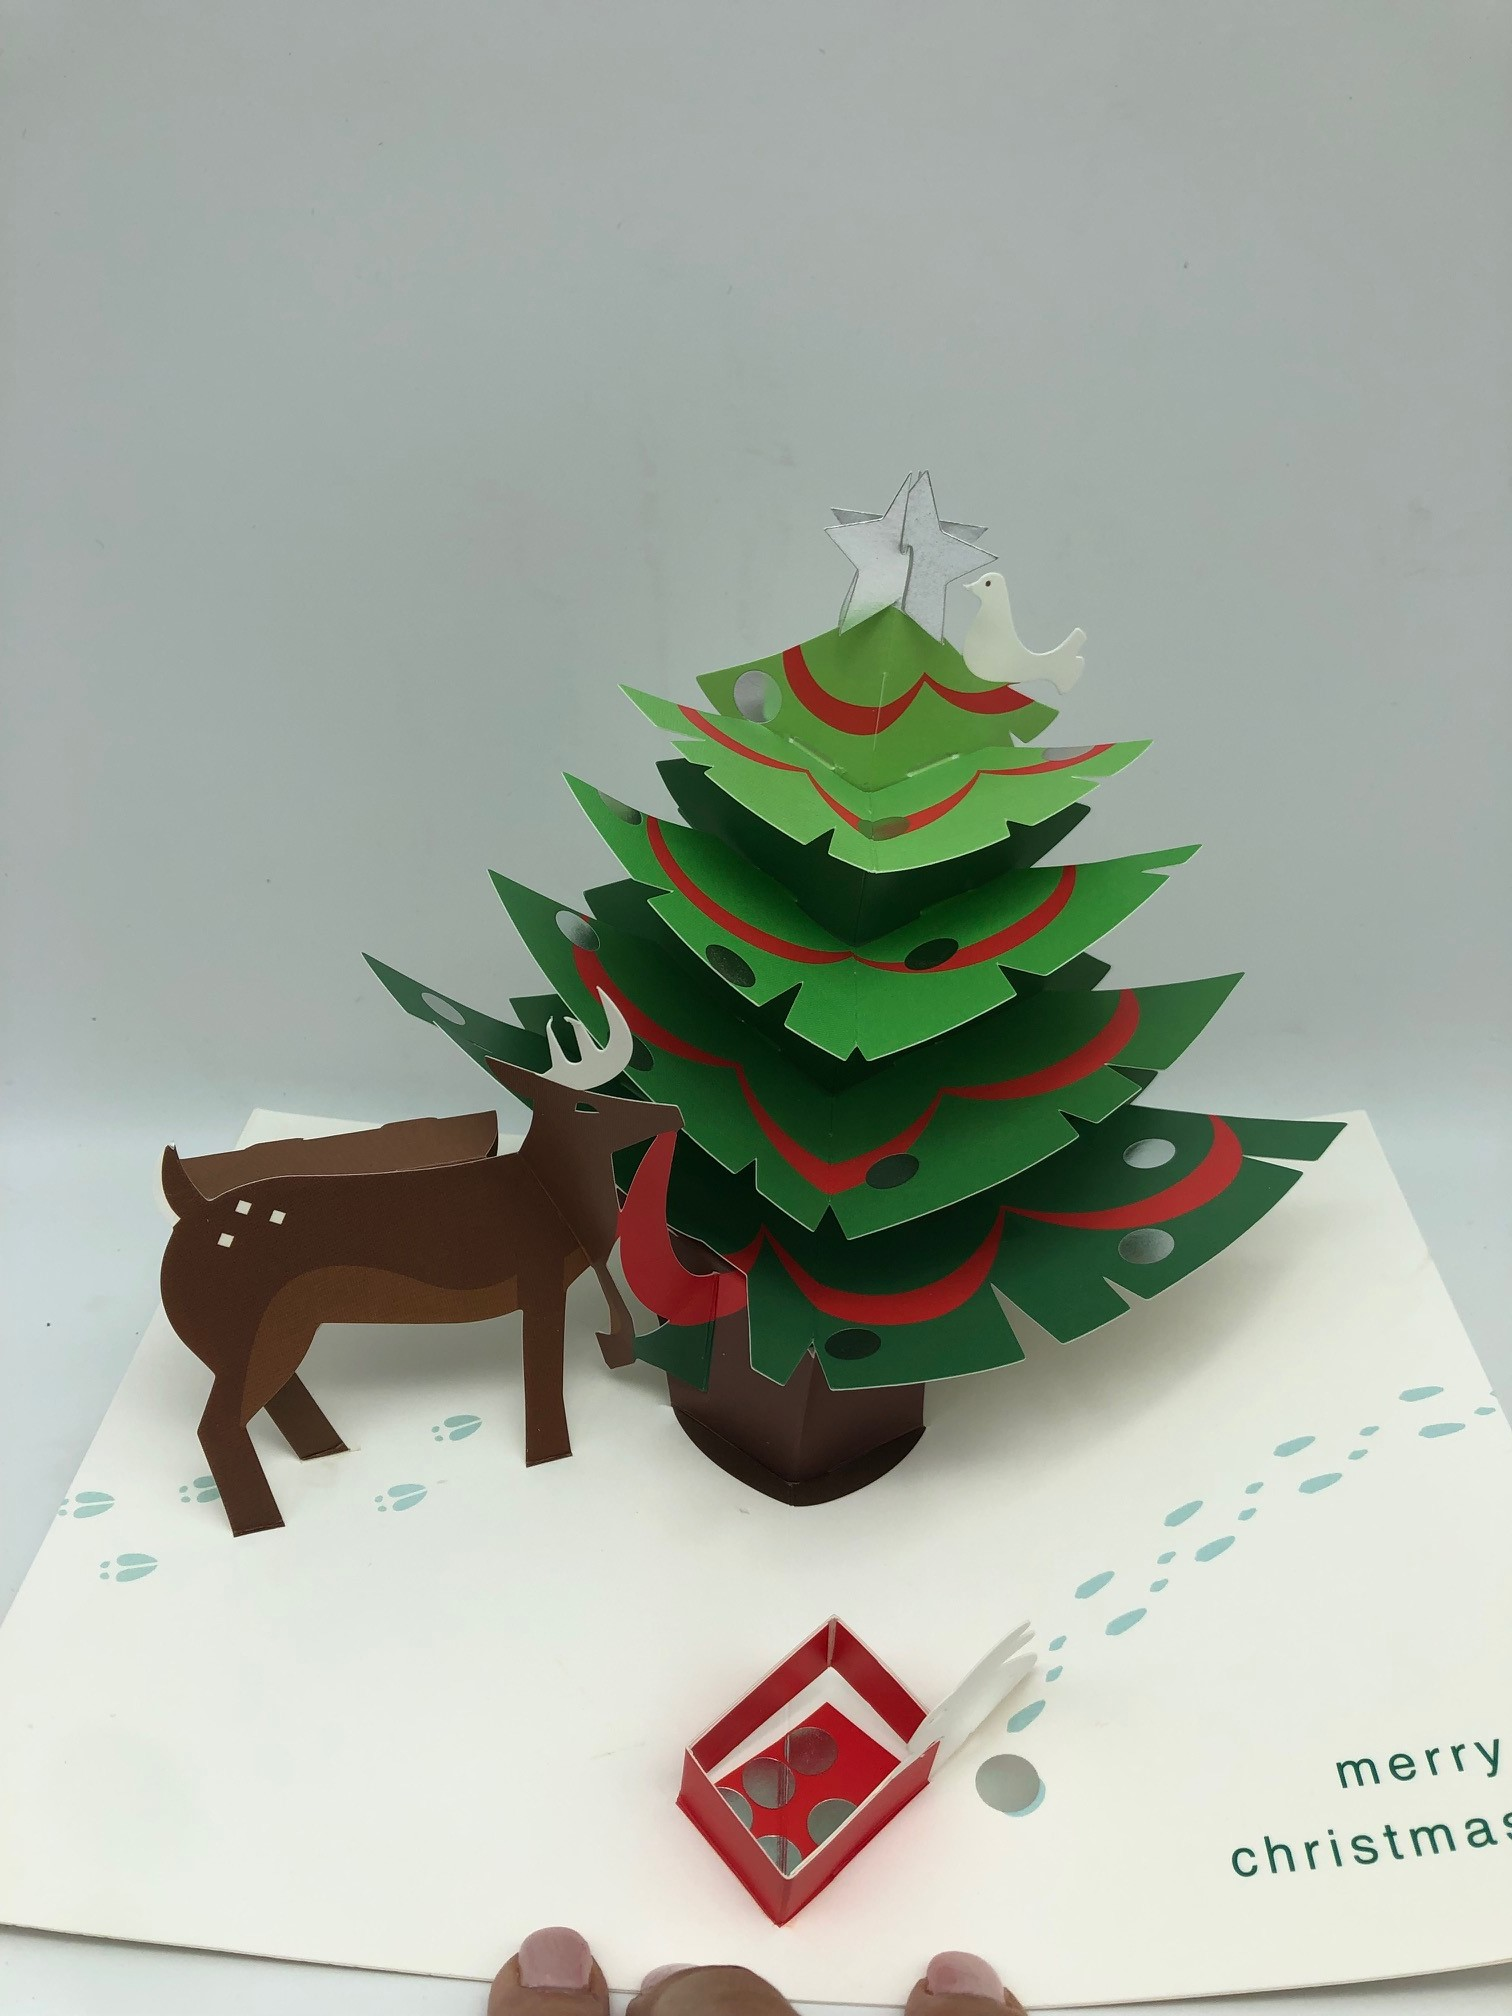 le 10 cadeau (2).jpg